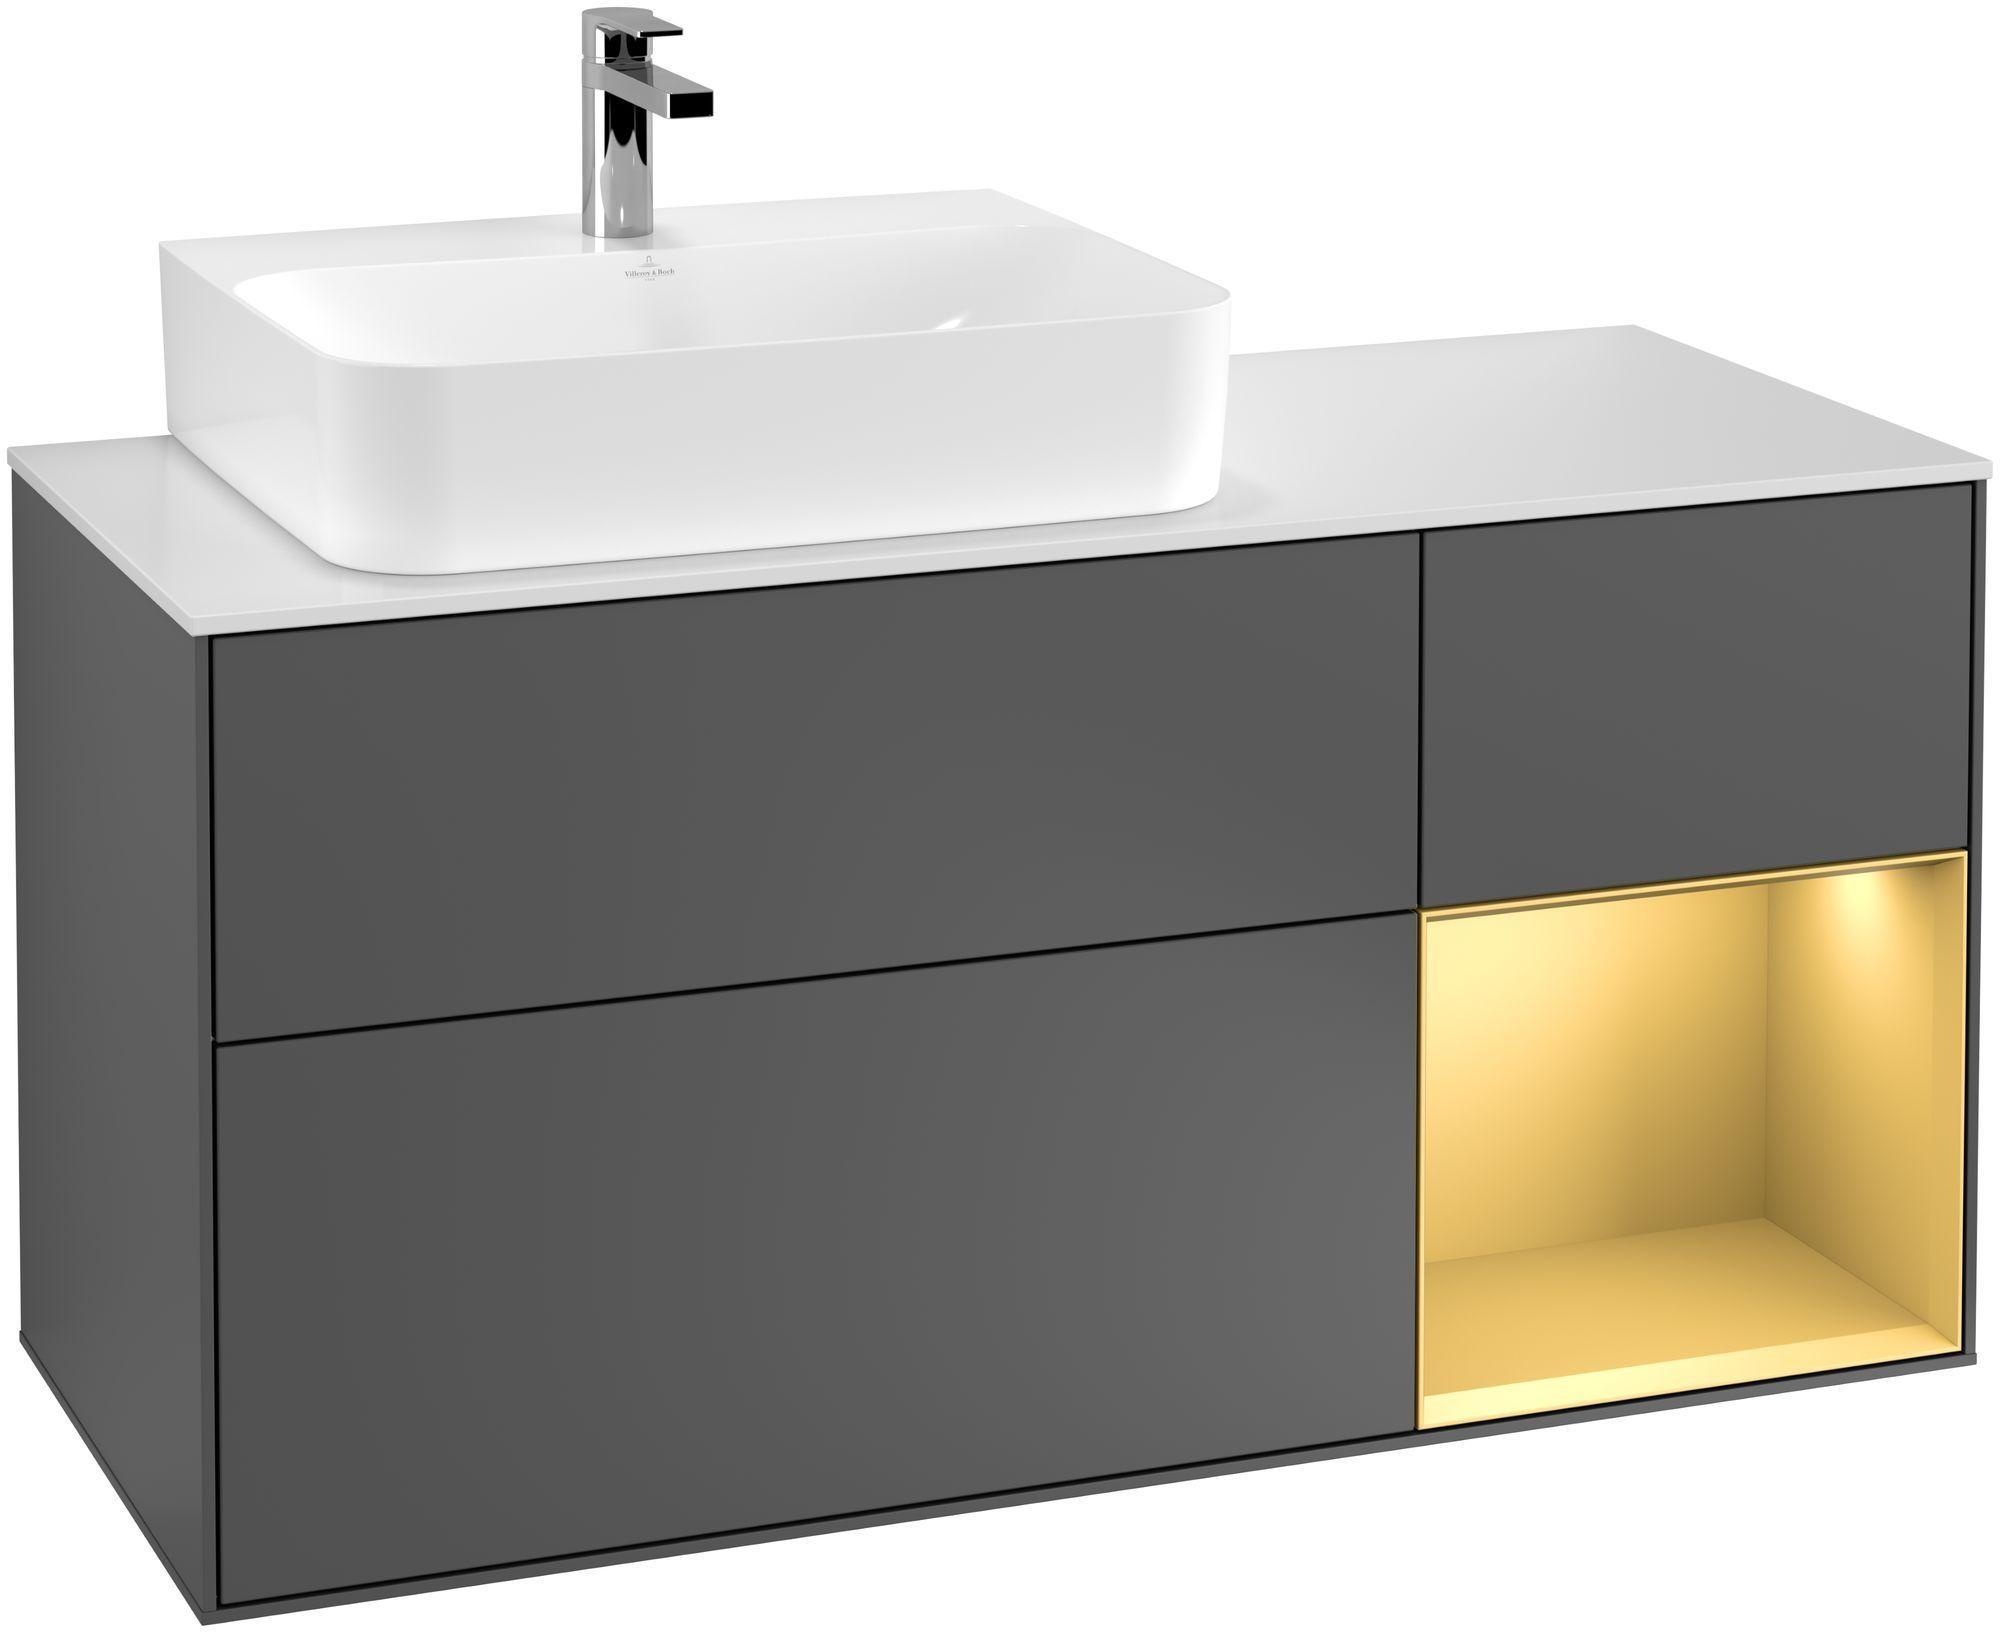 Villeroy & Boch Finion G15 Waschtischunterschrank mit Regalelement 3 Auszüge Waschtisch links LED-Beleuchtung B:120xH:60,3xT:50,1cm Front, Korpus: Anthracite Matt, Regal: Gold Matt, Glasplatte: White Matt G151HFGK